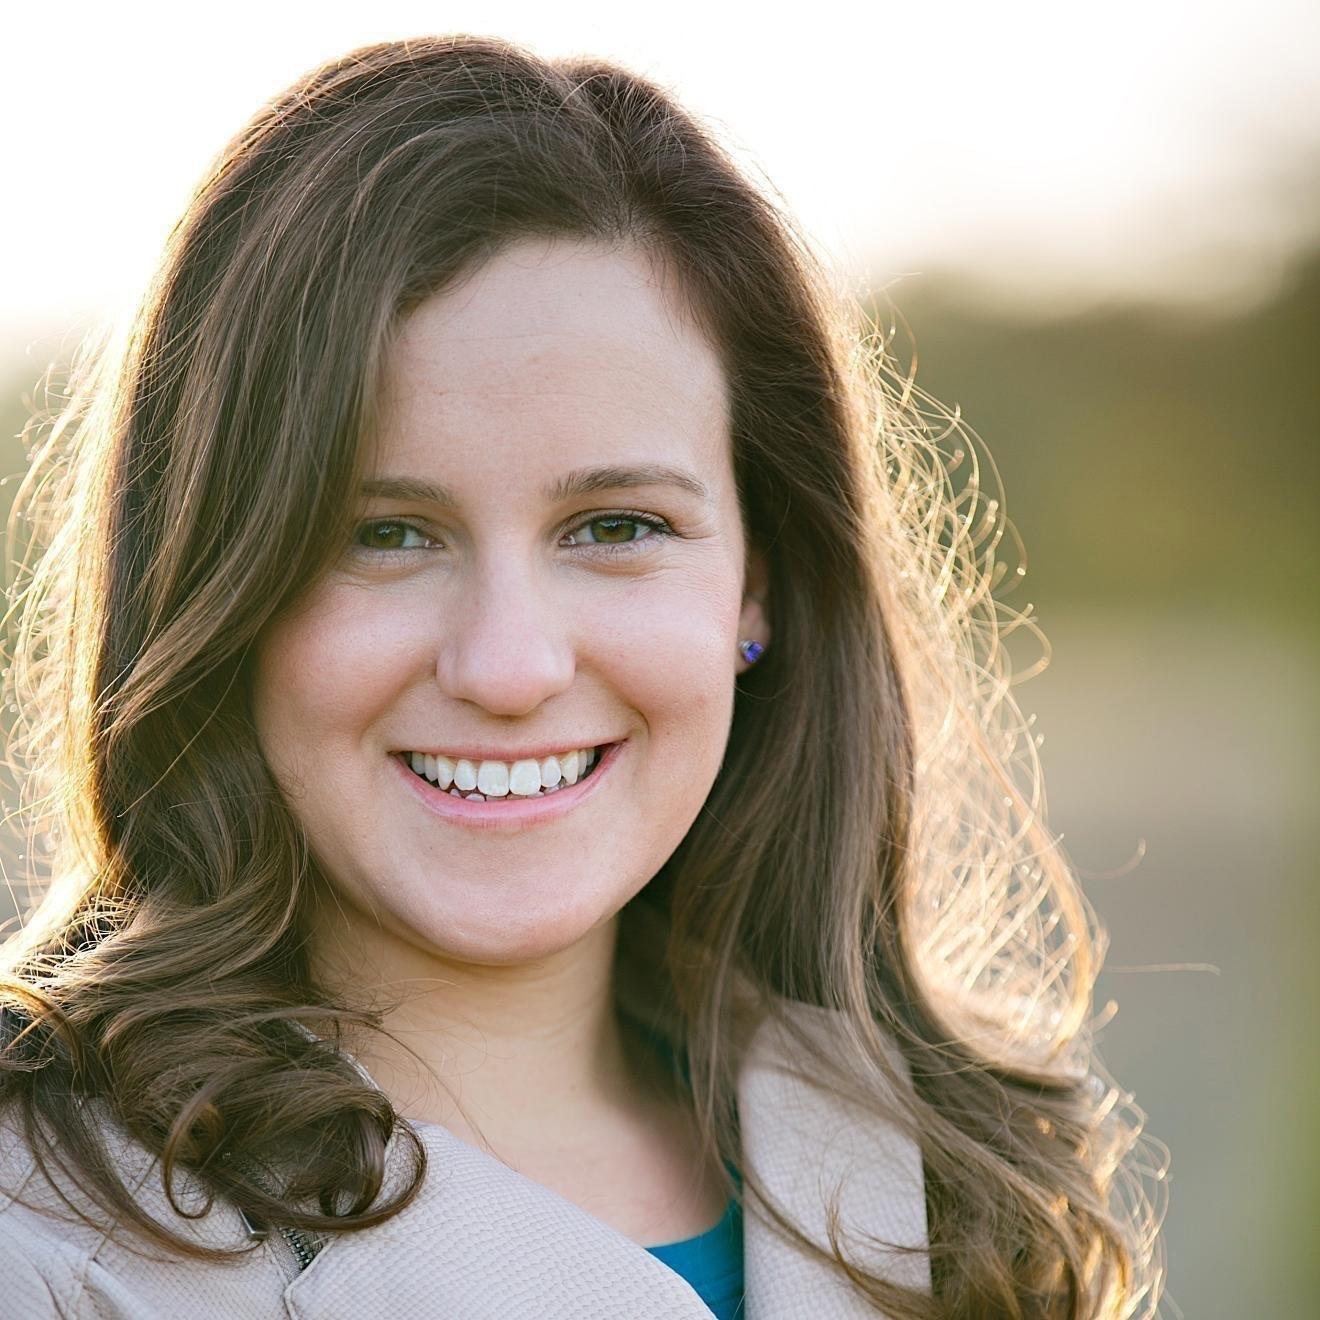 Courtney Beyer